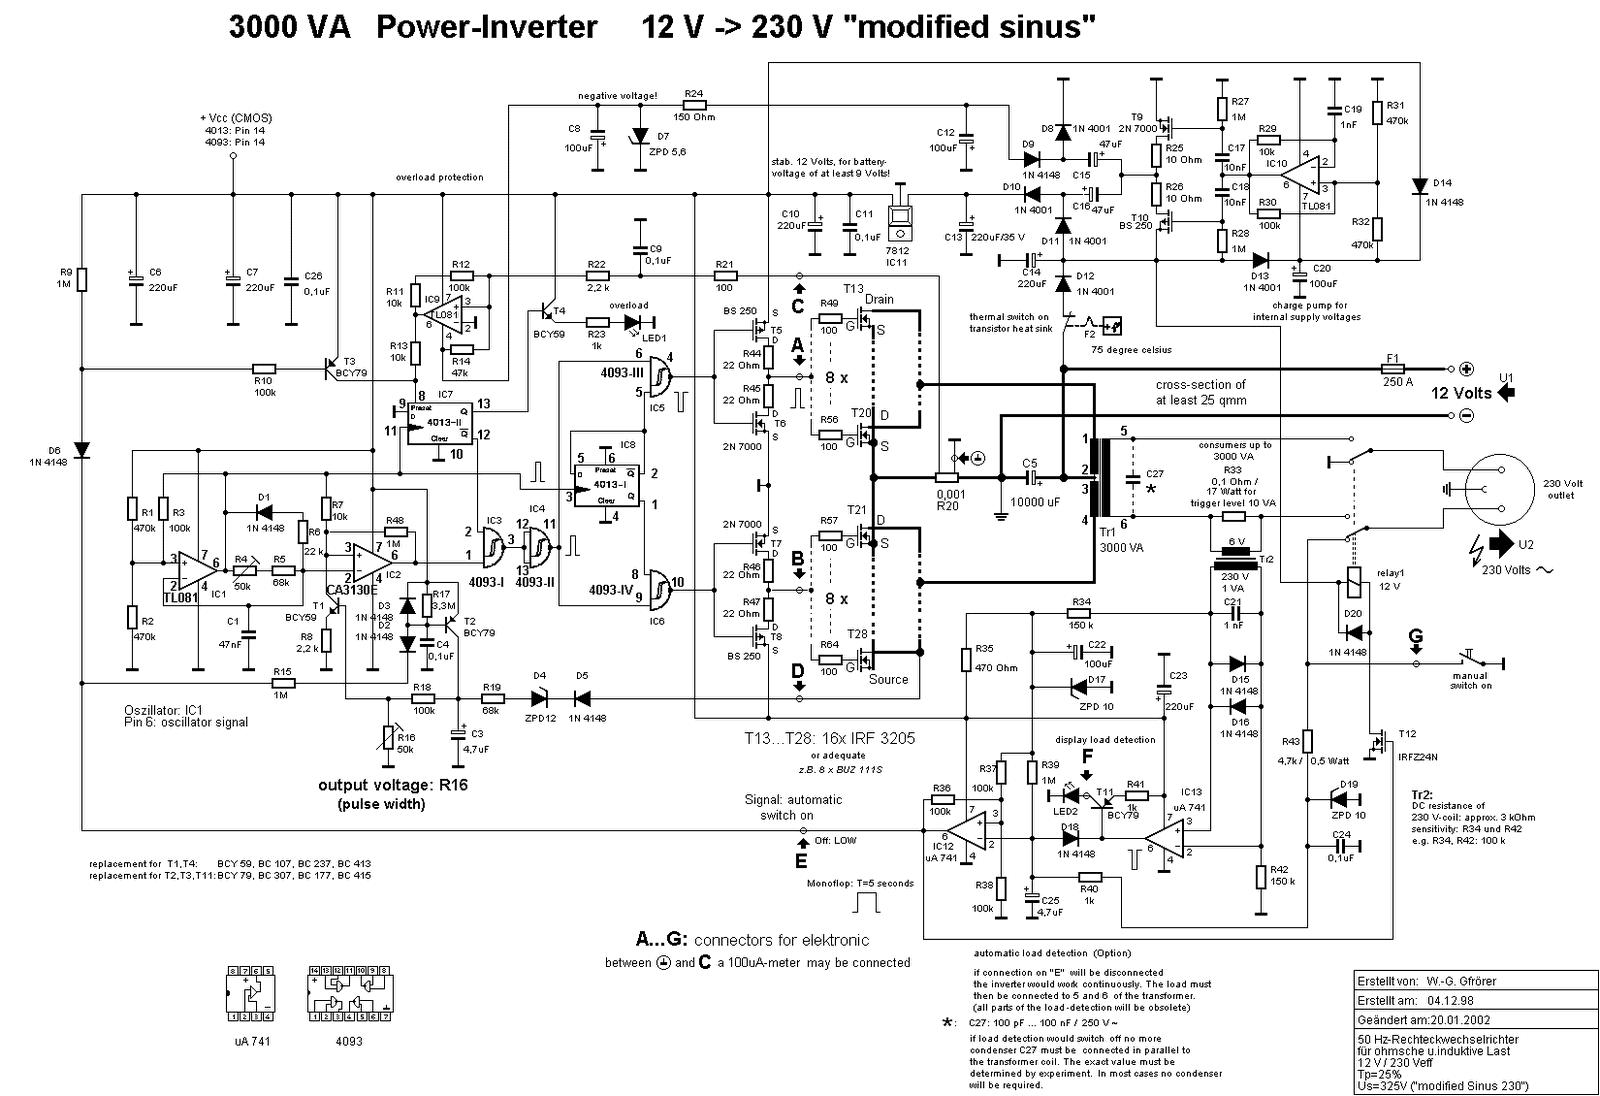 circuit diagram of 3000 watt power inverter 12v dc to 230v ac